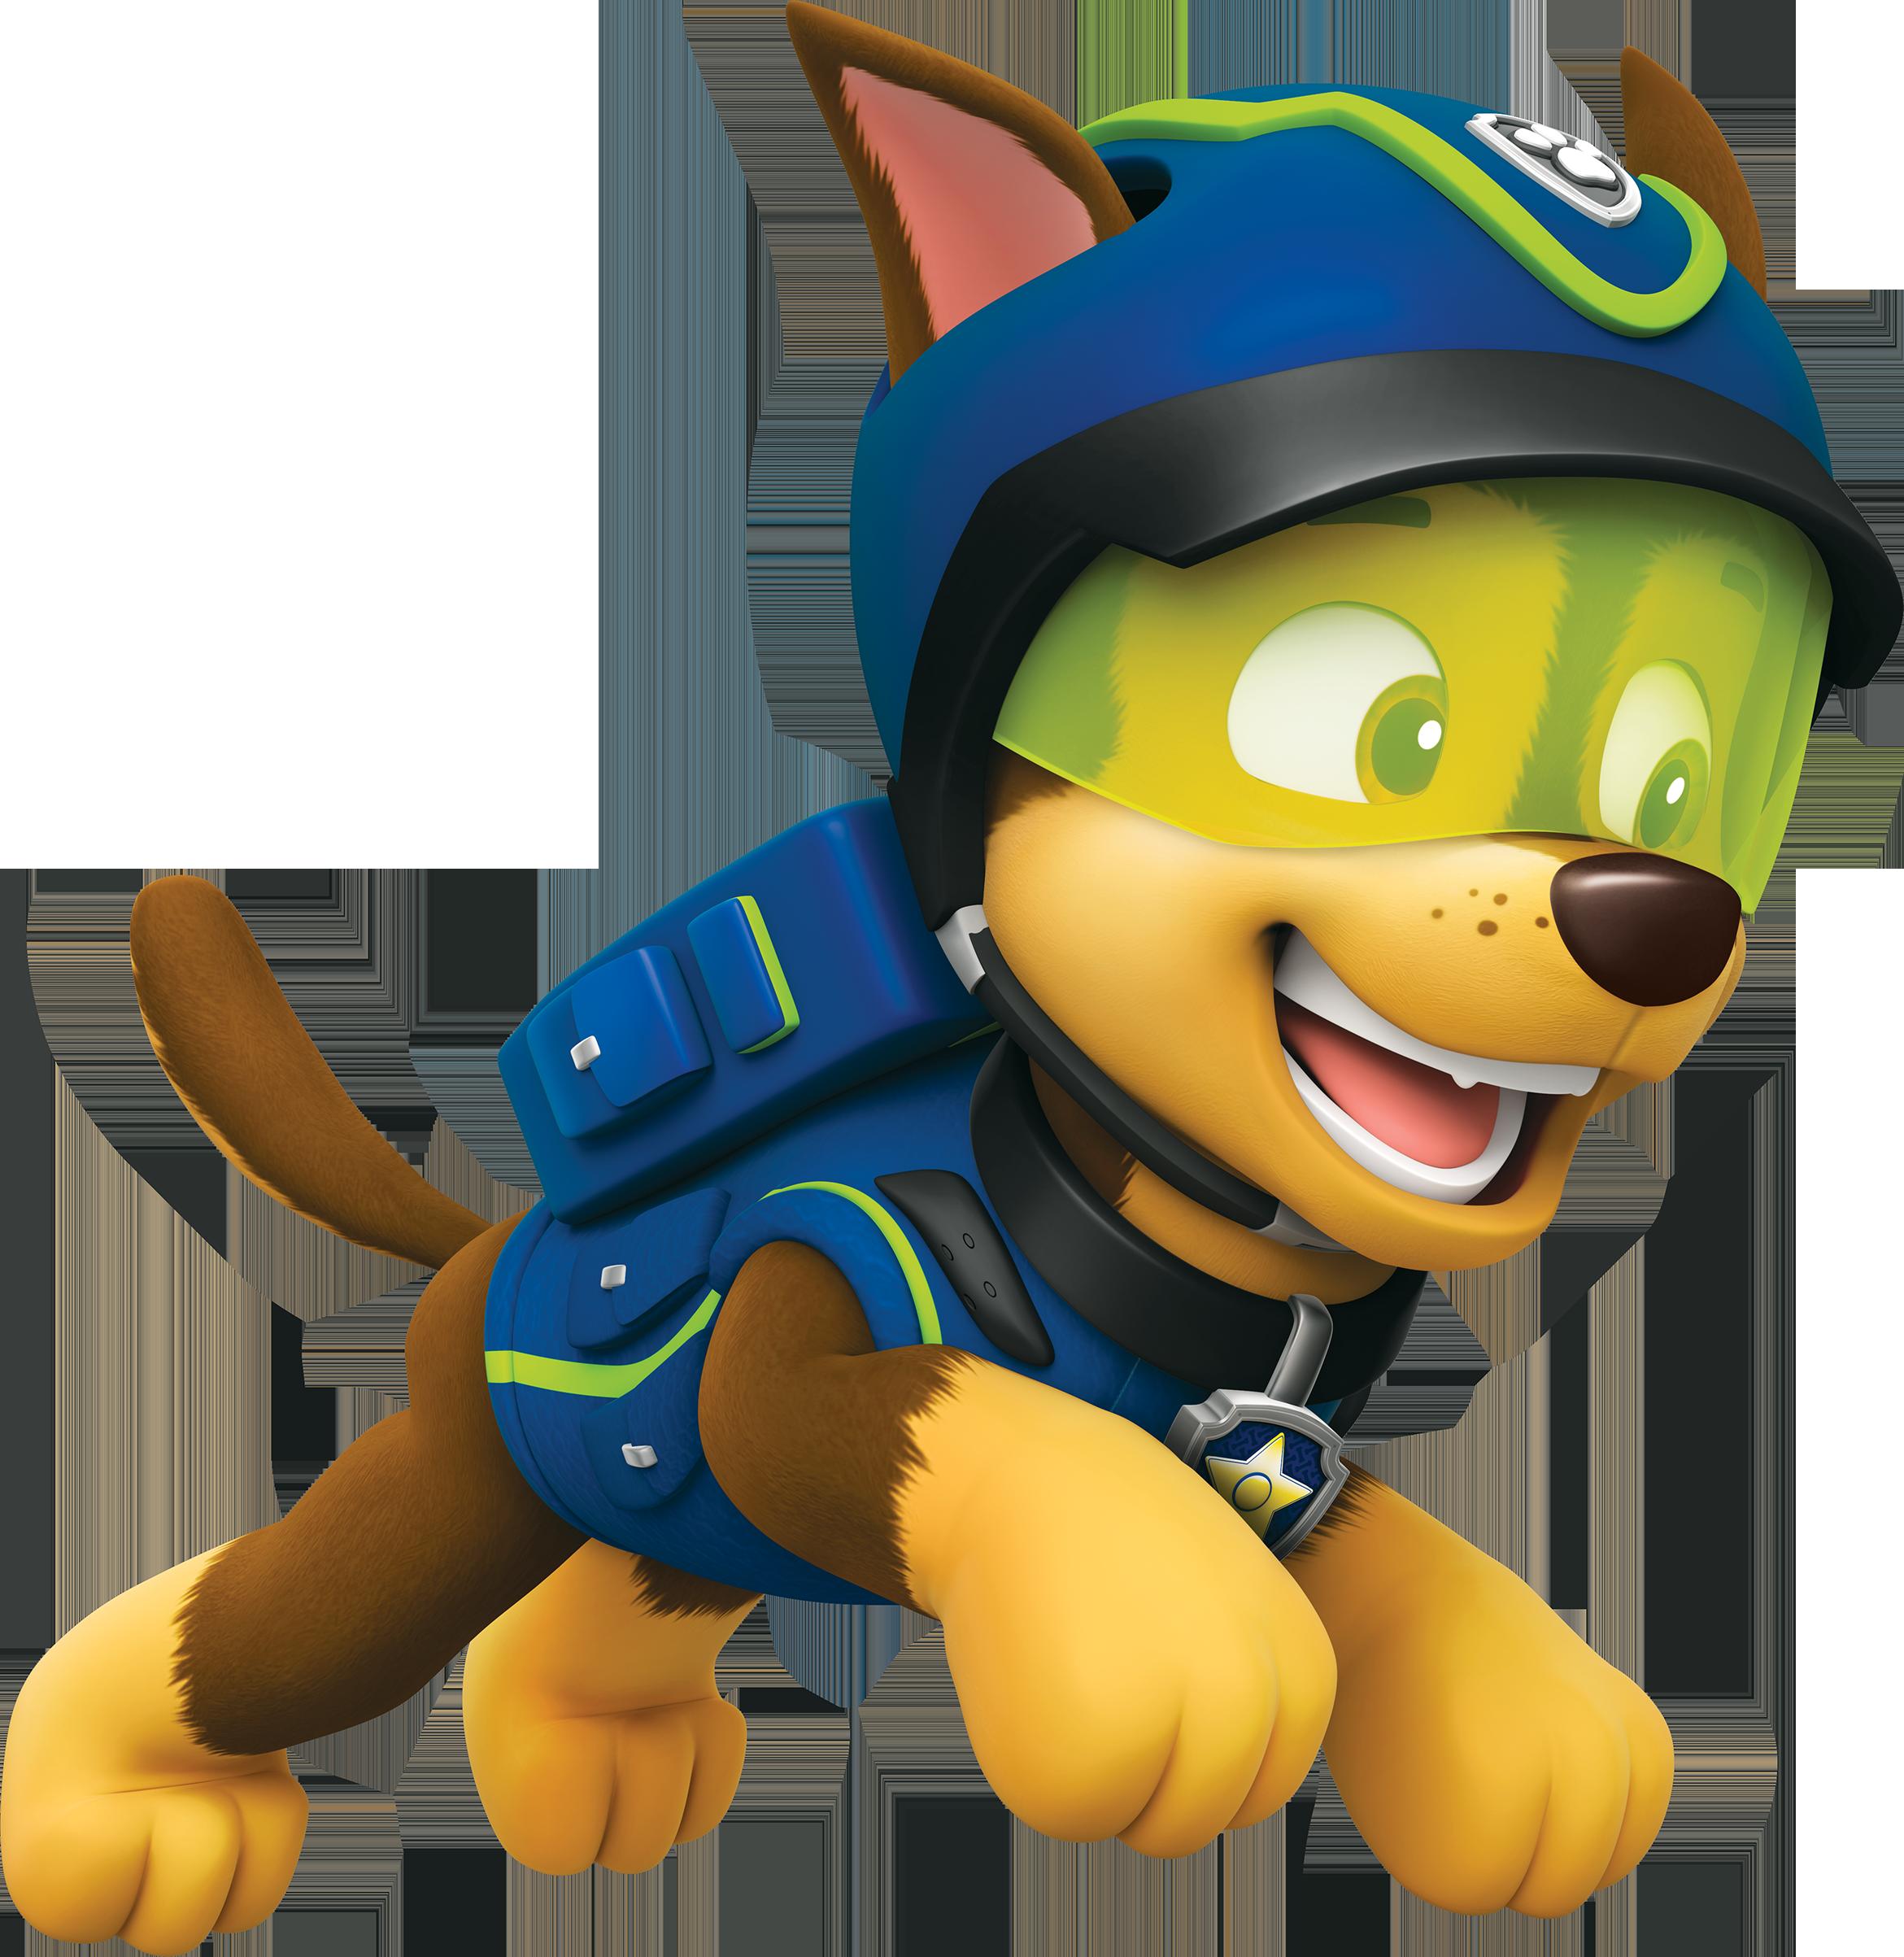 Paw patrol police dog clipart png transparent download latest (2341×2406) | Paw Patrol | Pinterest | Paw patrol png transparent download